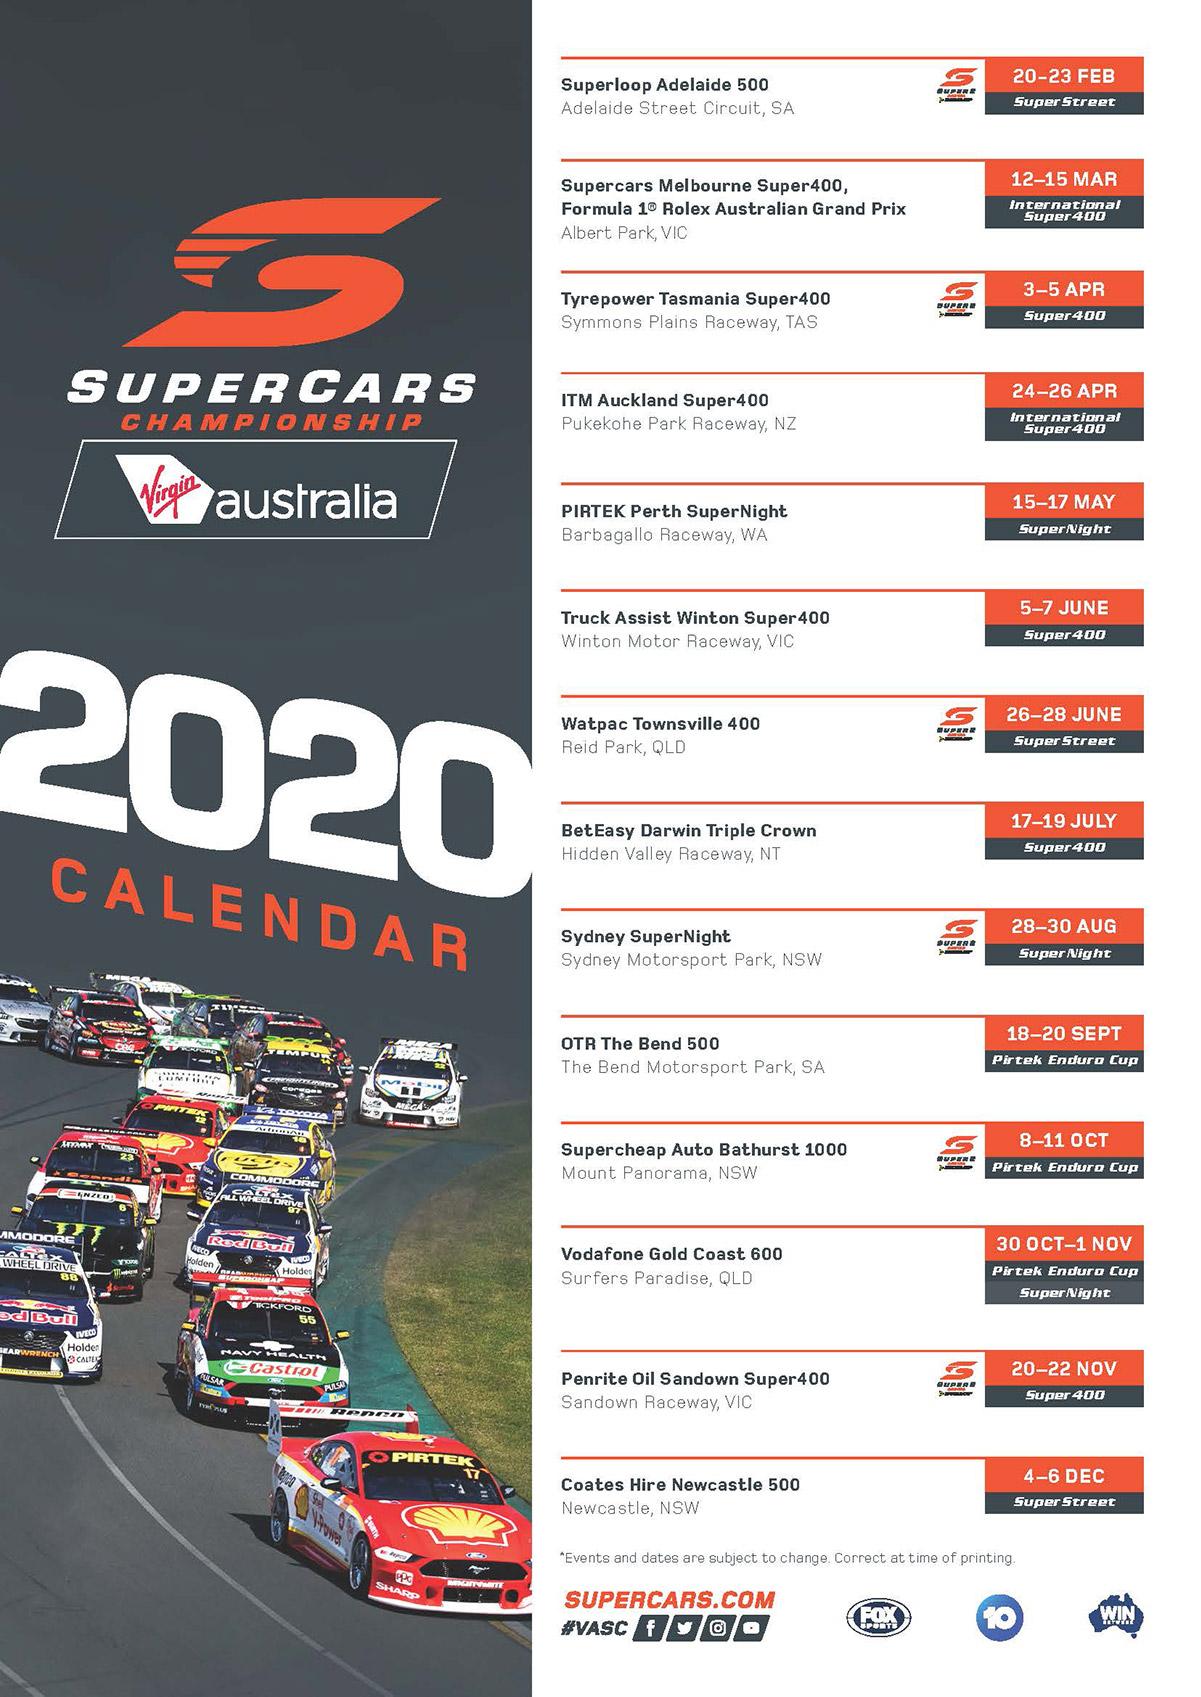 SC2020-BRAND-Championship-Calendar.jpg